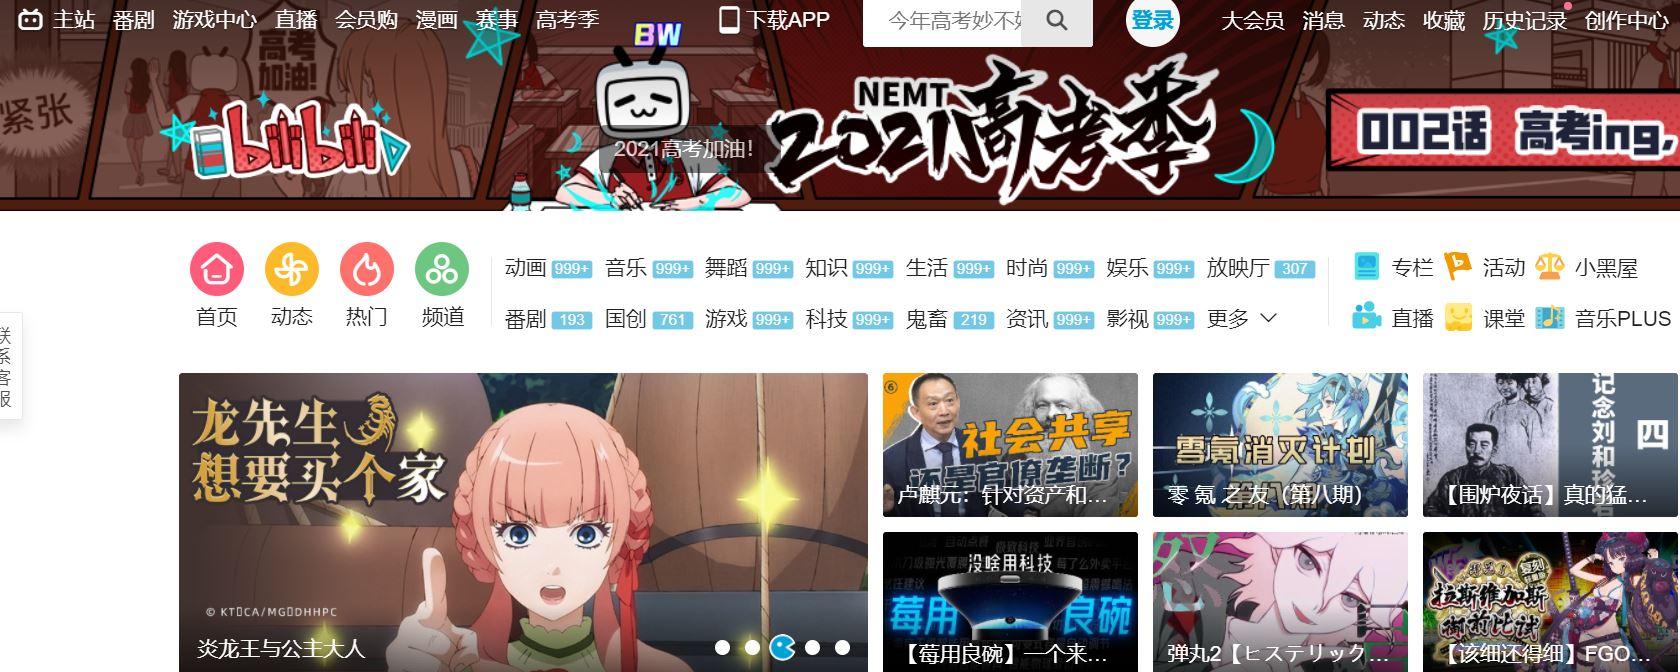 Bilibili Chinese anime online watch